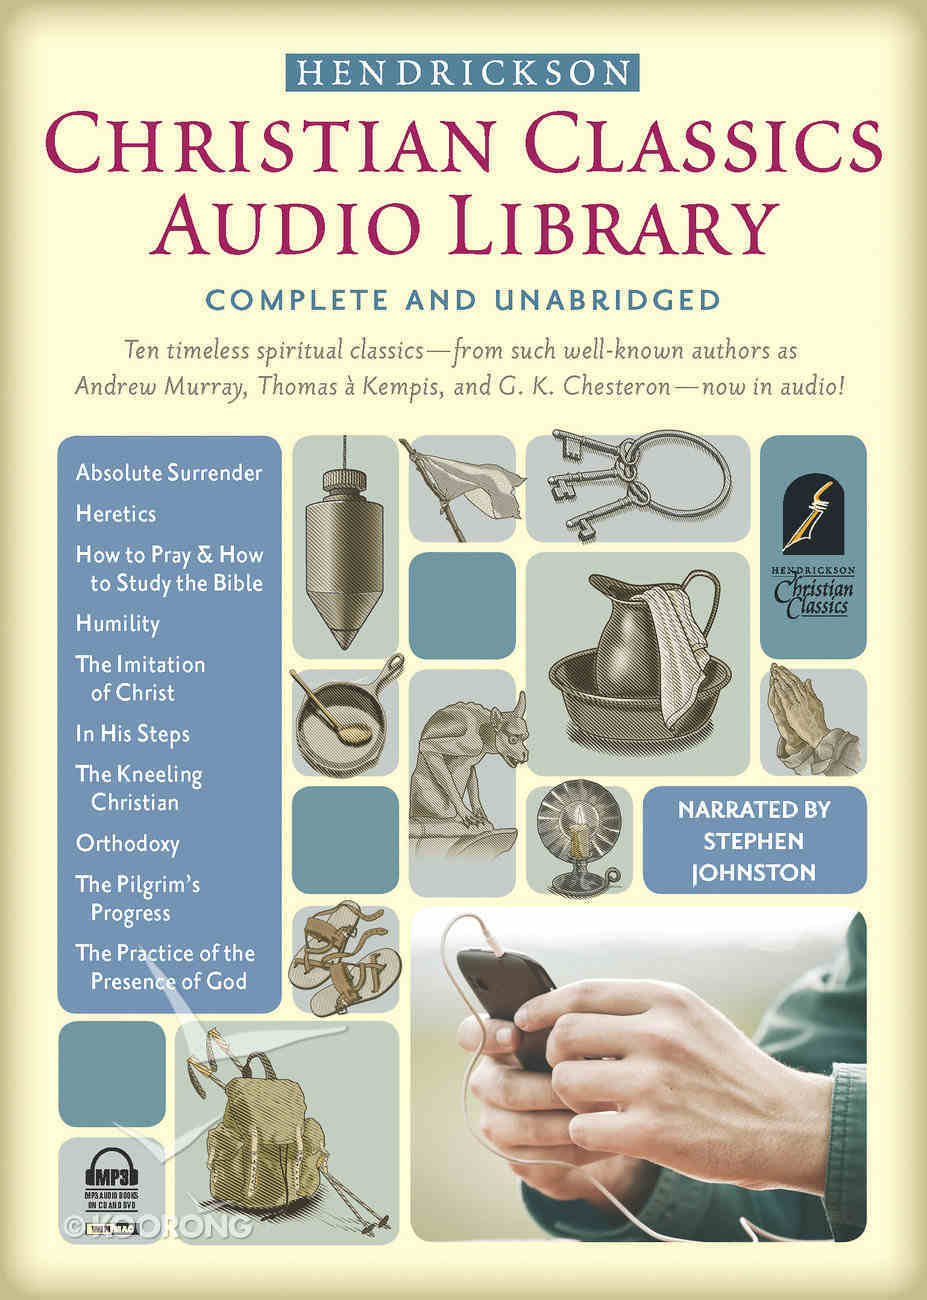 Hendrickson Christian Classics Audio Library (Mp3) Dvd-rom